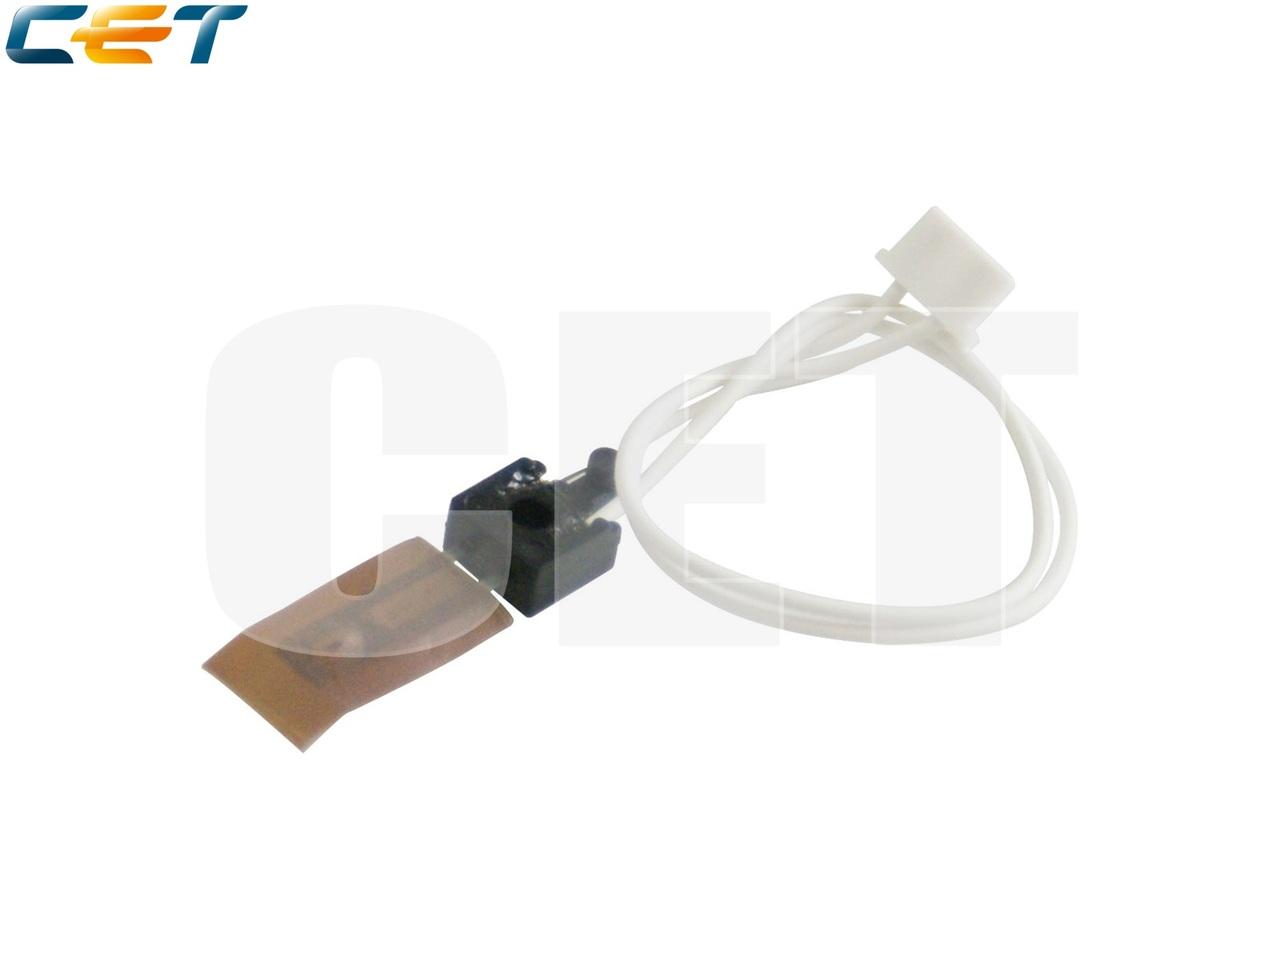 Термистор задний AW100109, AW10-0109, AW10-0096,AW10-0132 для RICOH Aficio 2051/2060/2075 (CET), CET5316